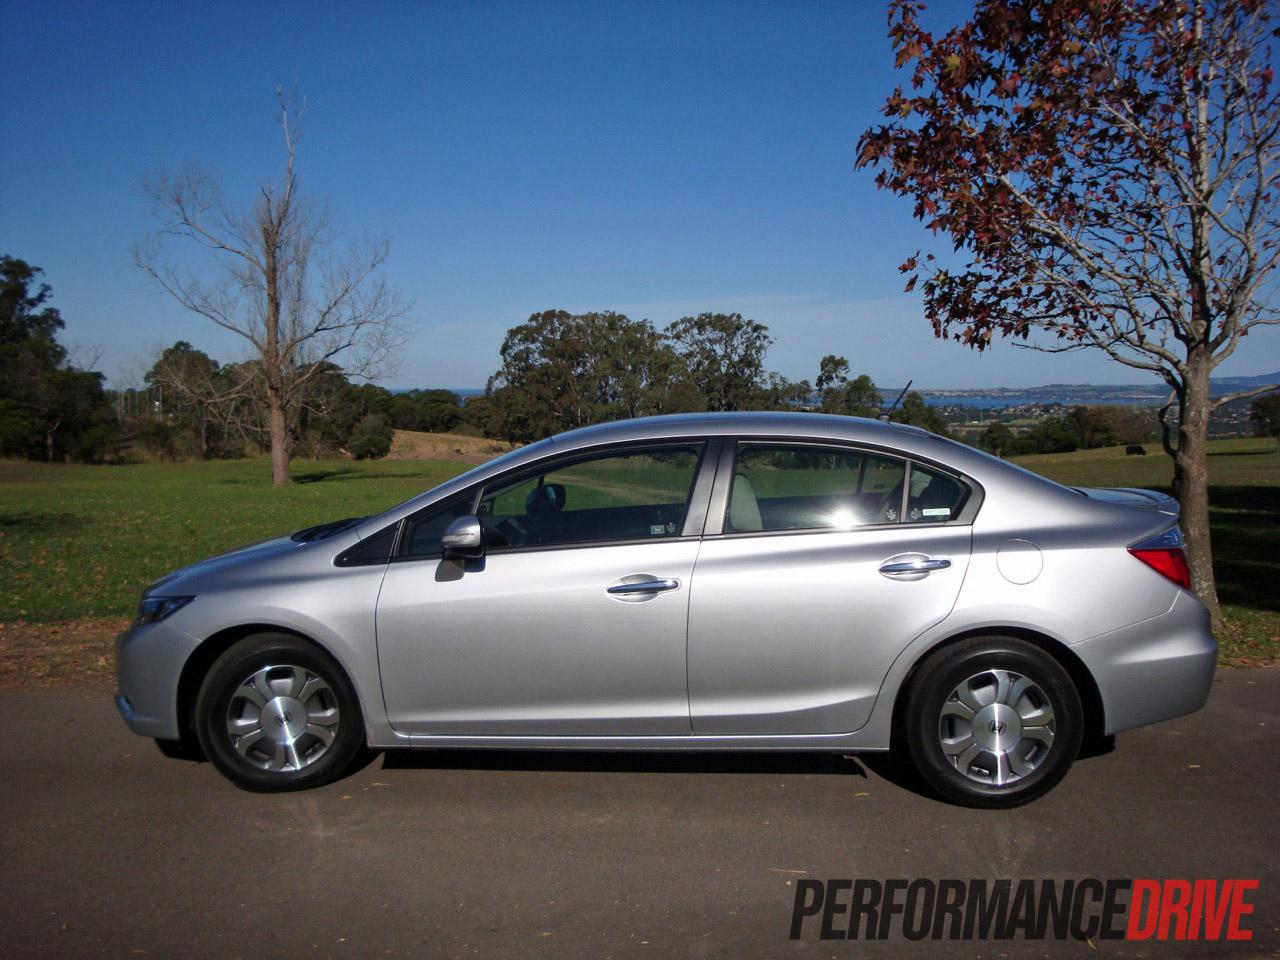 2012 honda civic hybrid review performancedrive for 2012 honda civic reviews